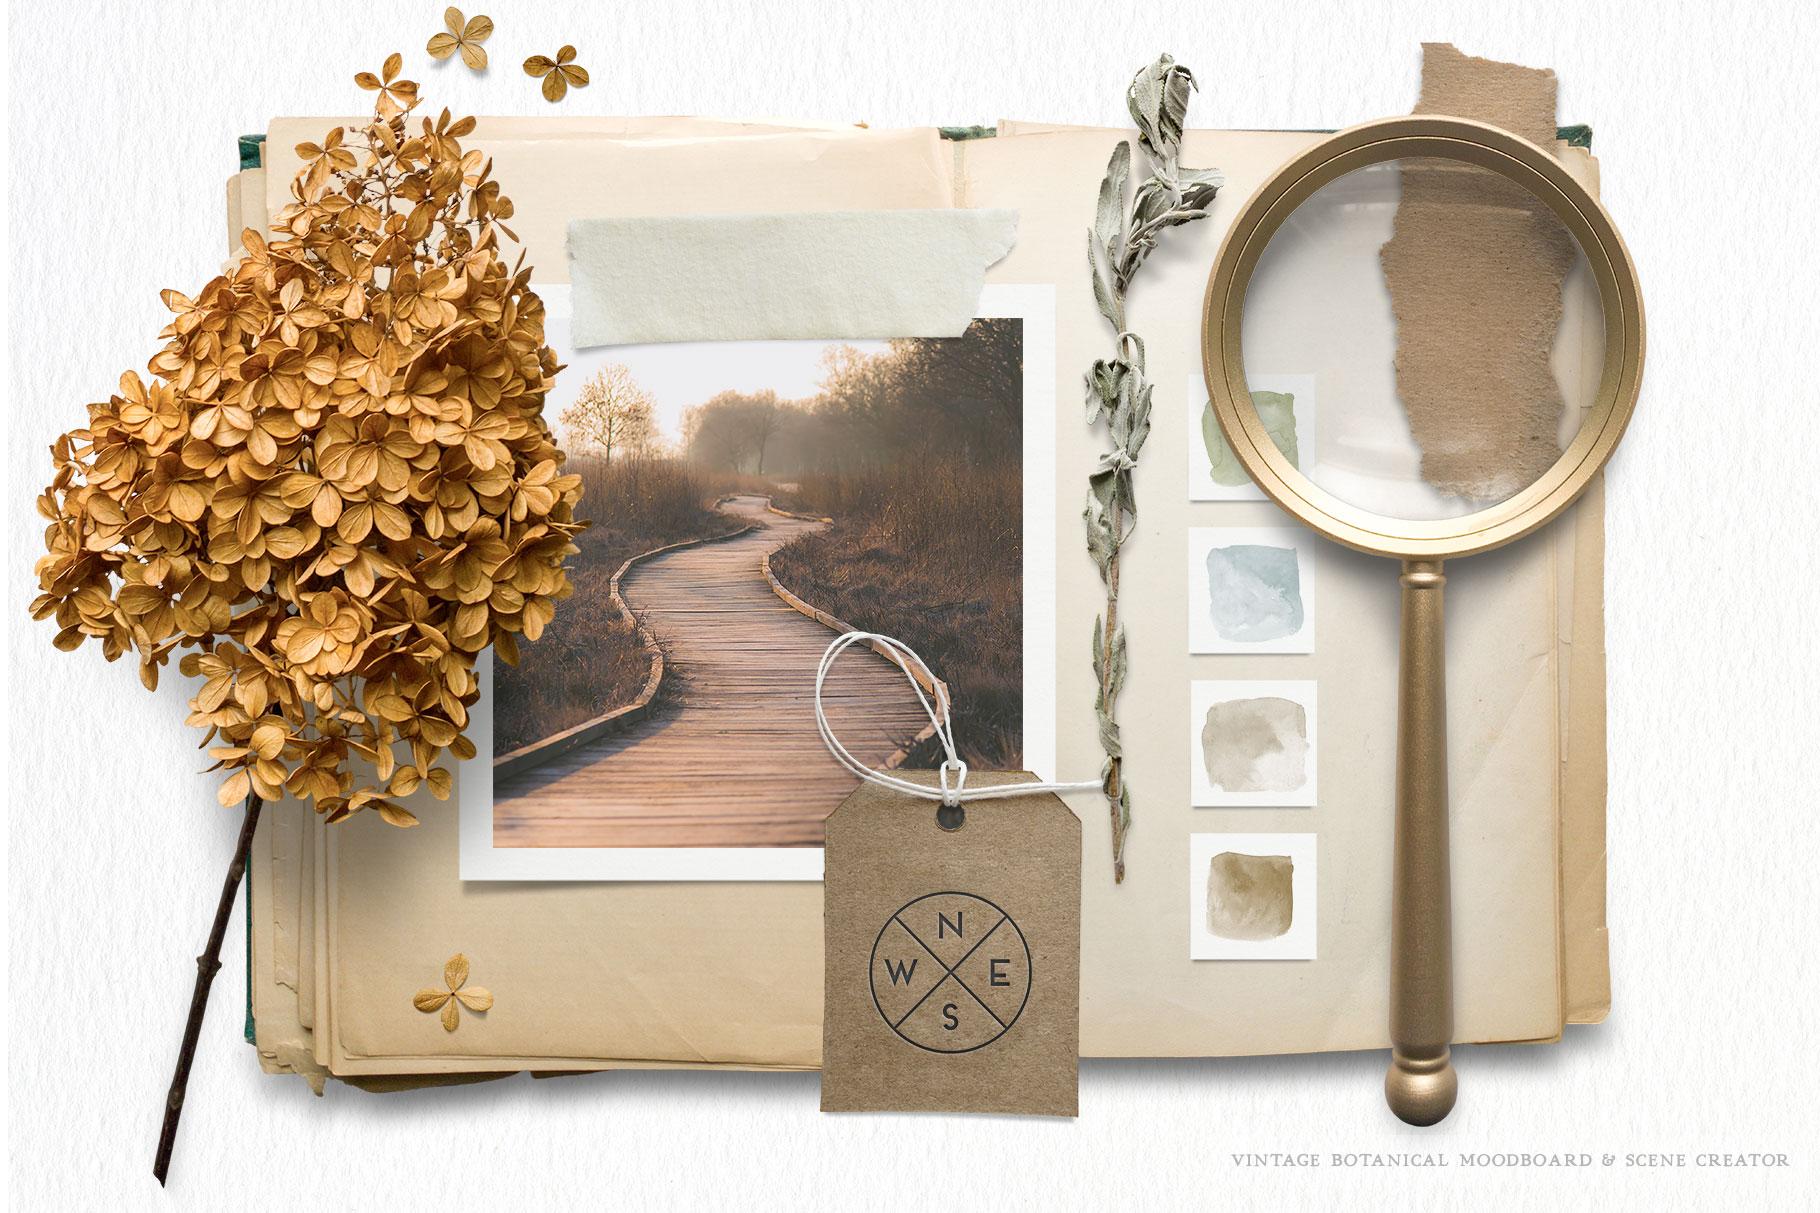 Botanical Moodboard Scene Creator example image 12